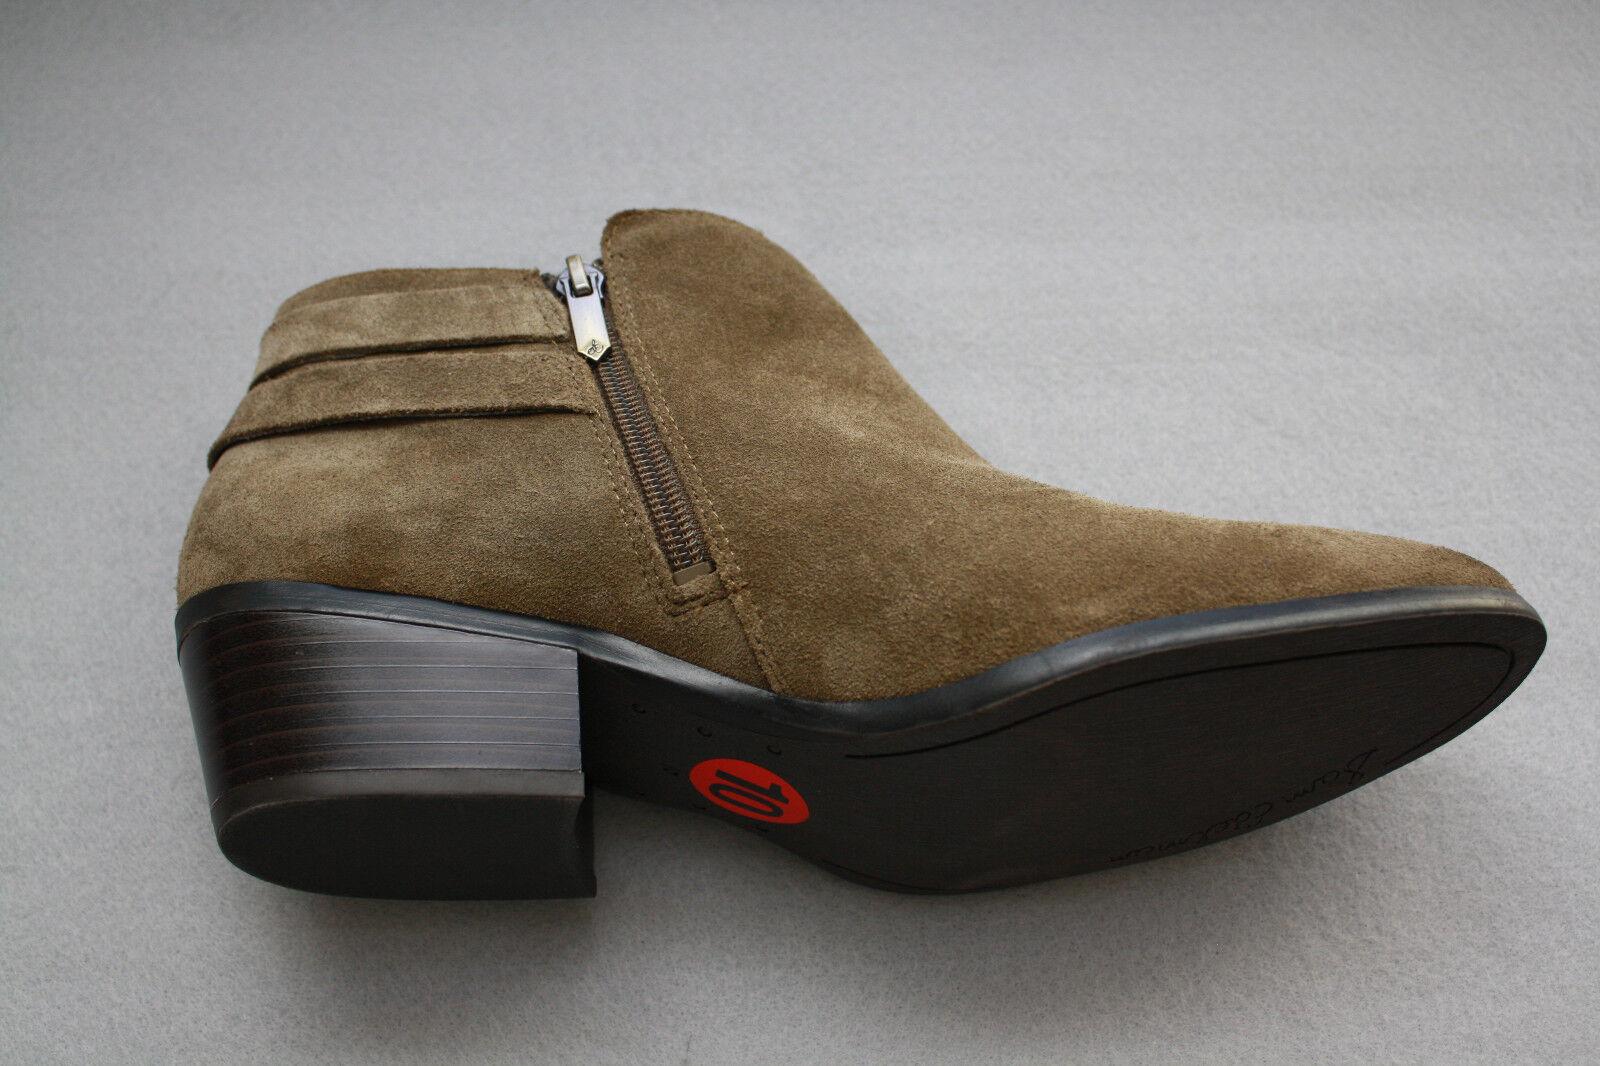 Sam Edelman Petal Stiefelies Suede in Ankle Stiefel in Suede Olive Grün Sz 10 NEW 73bd3a